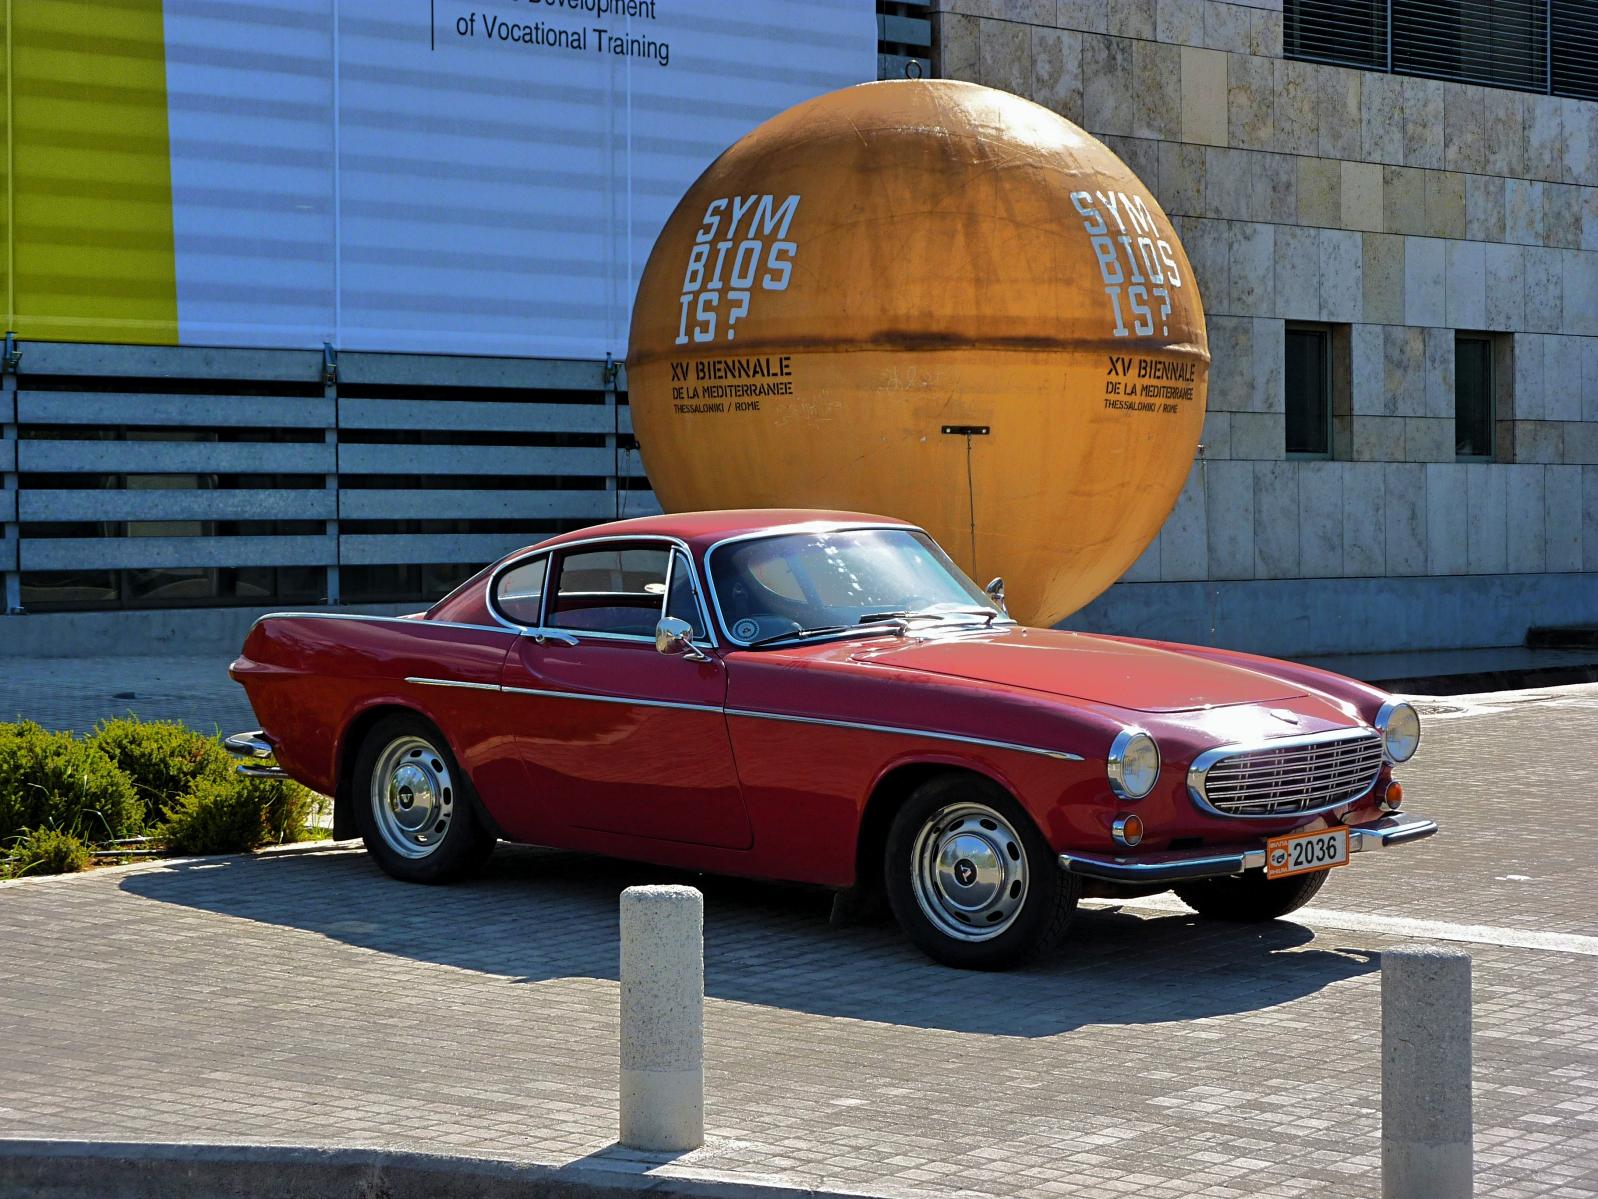 1965 Volvo P1800 (LEKAM) (49)